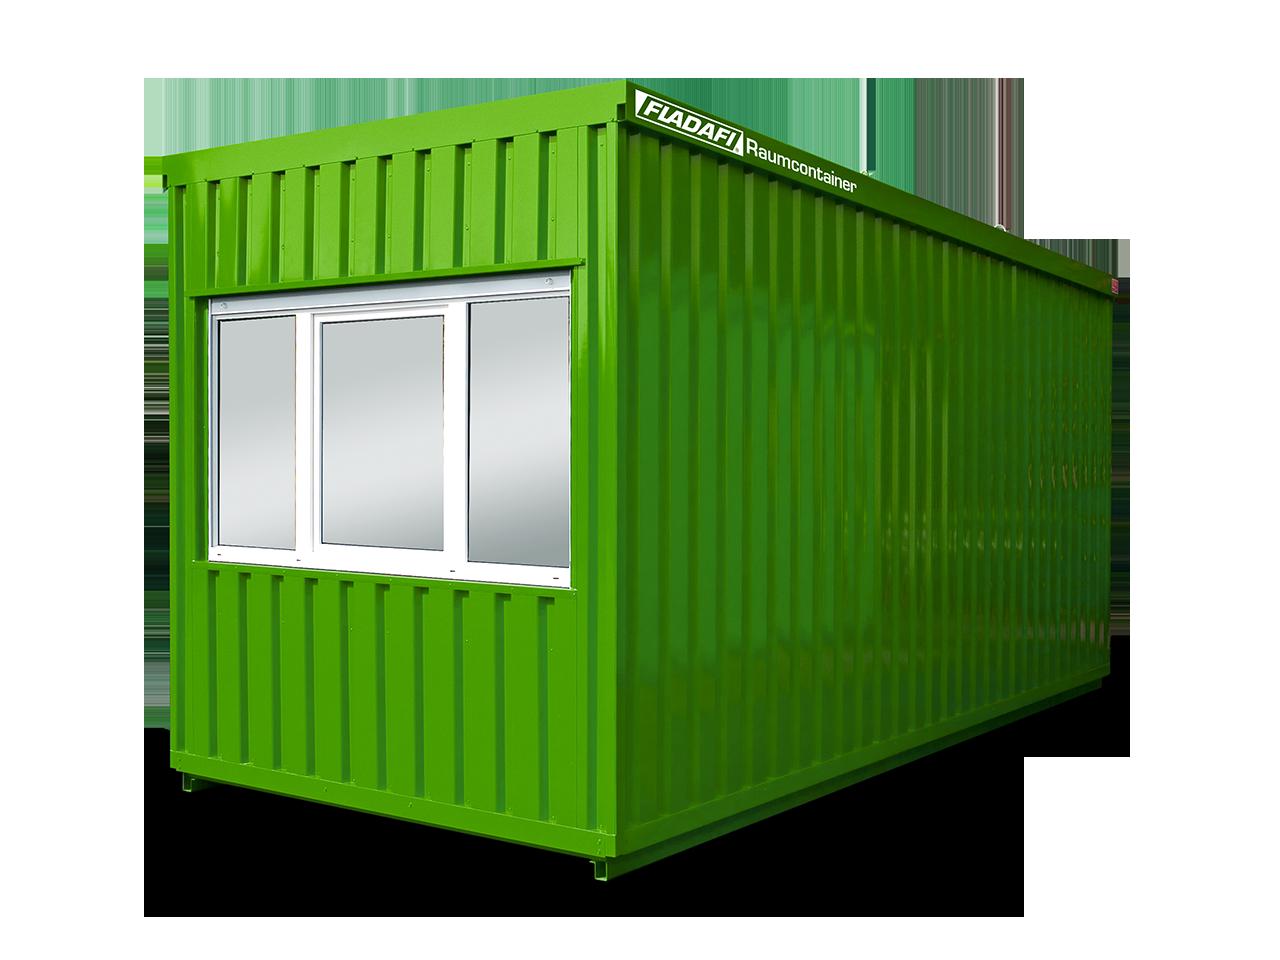 6801_FLADAFI-Raumcontainer-6M-6801_RC6M6801_RGB_0014_ft_sn_sl.png